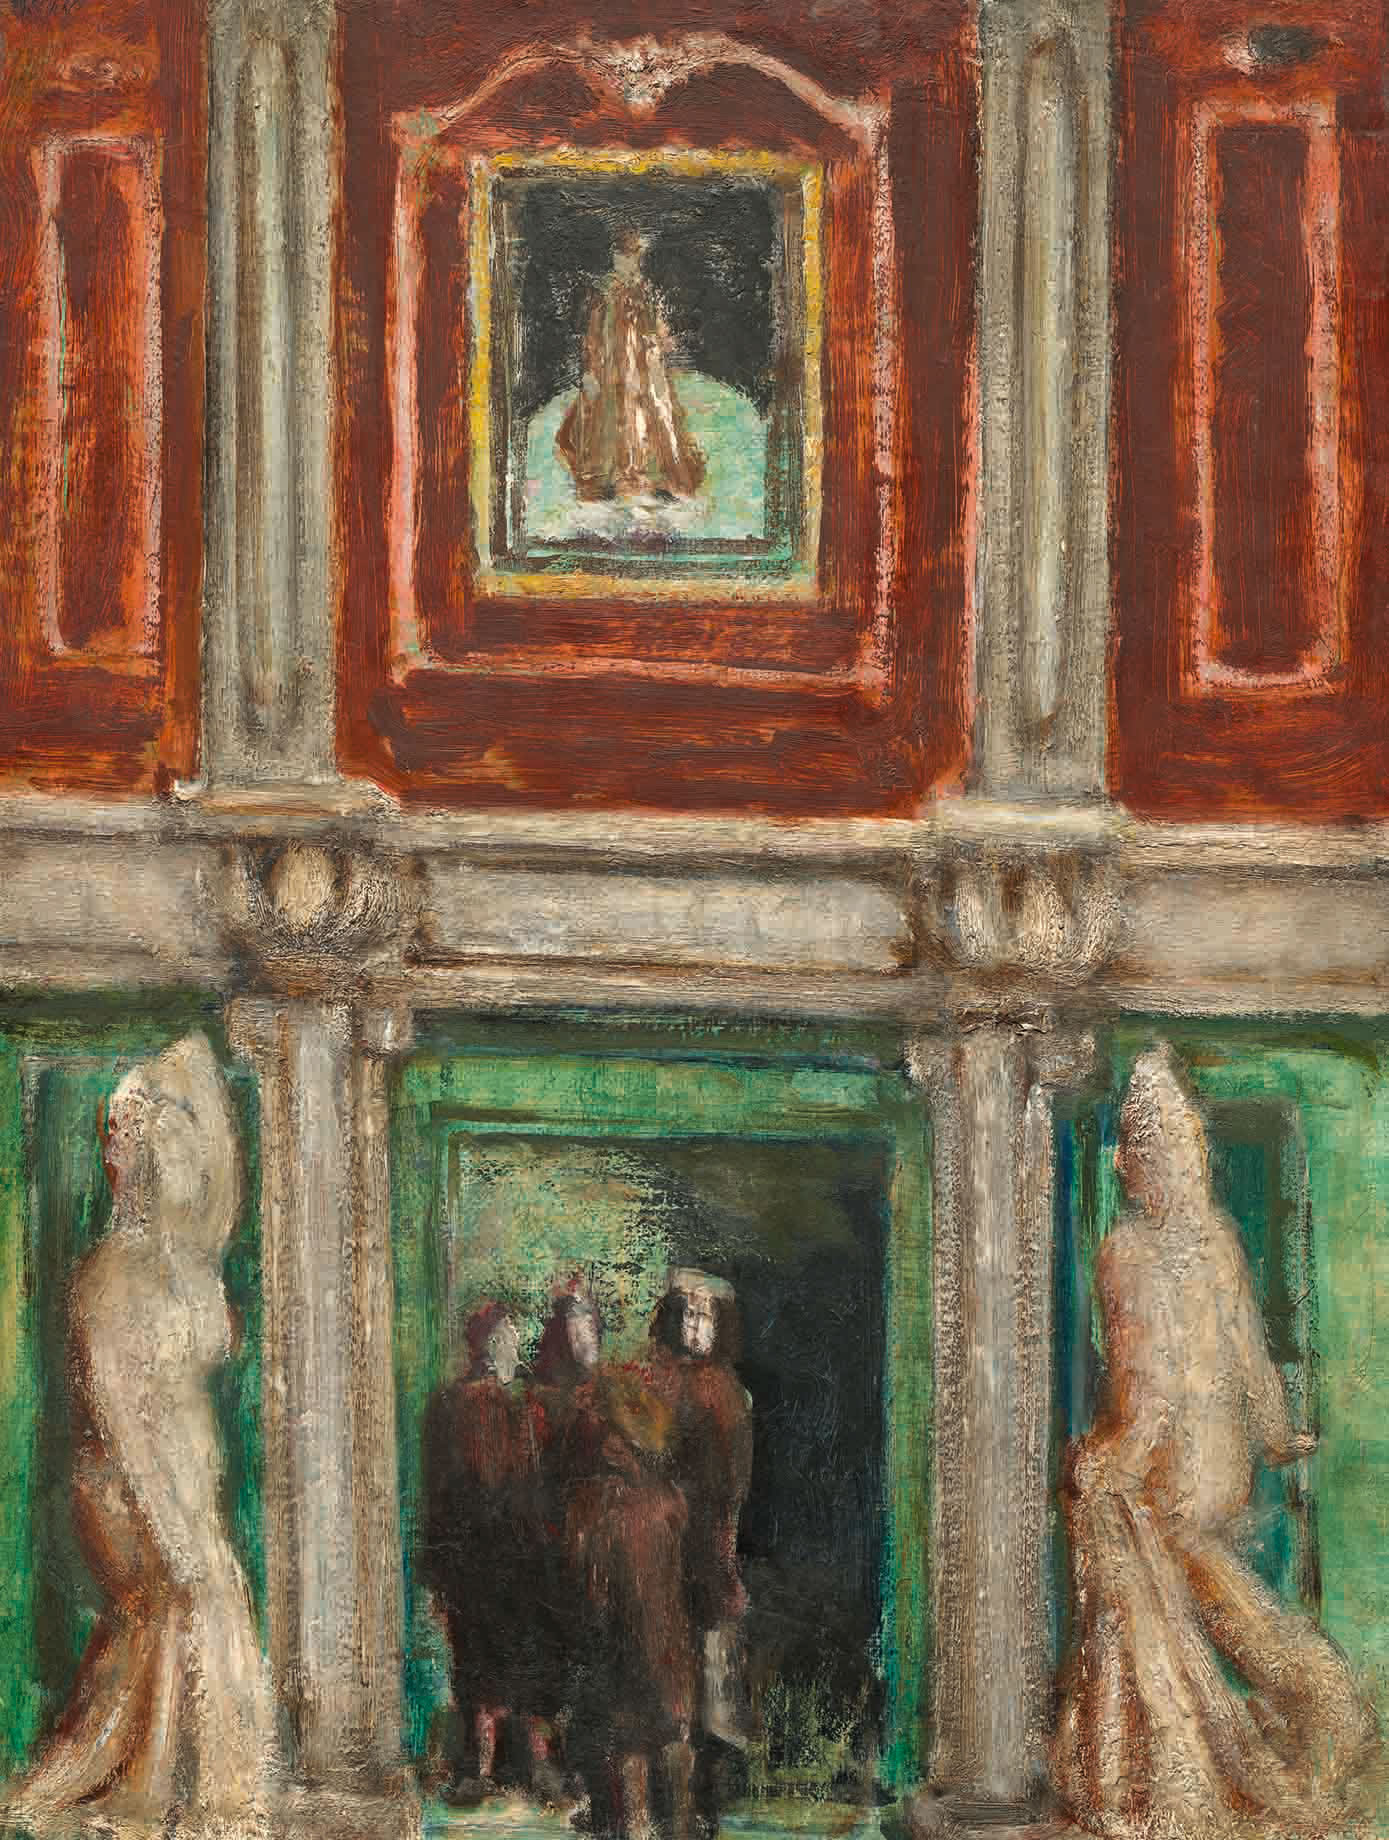 Mark Rothko: Interior, 1936; click image to enlarge